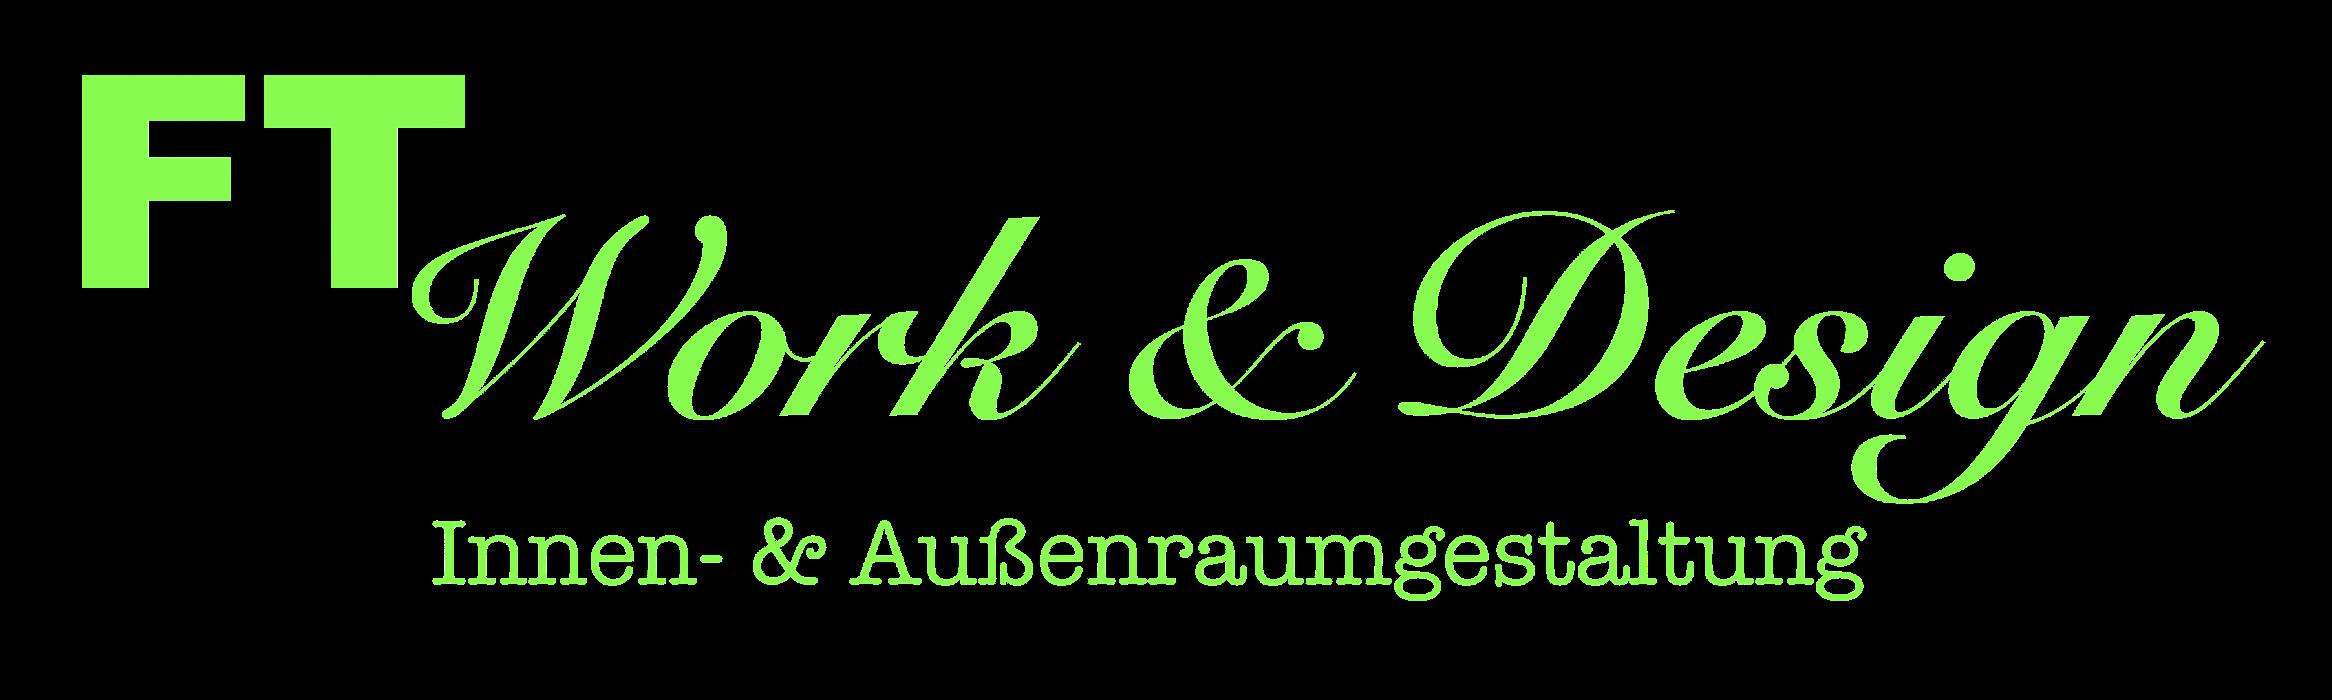 Bild zu FT Work & Design in Bad Münstereifel